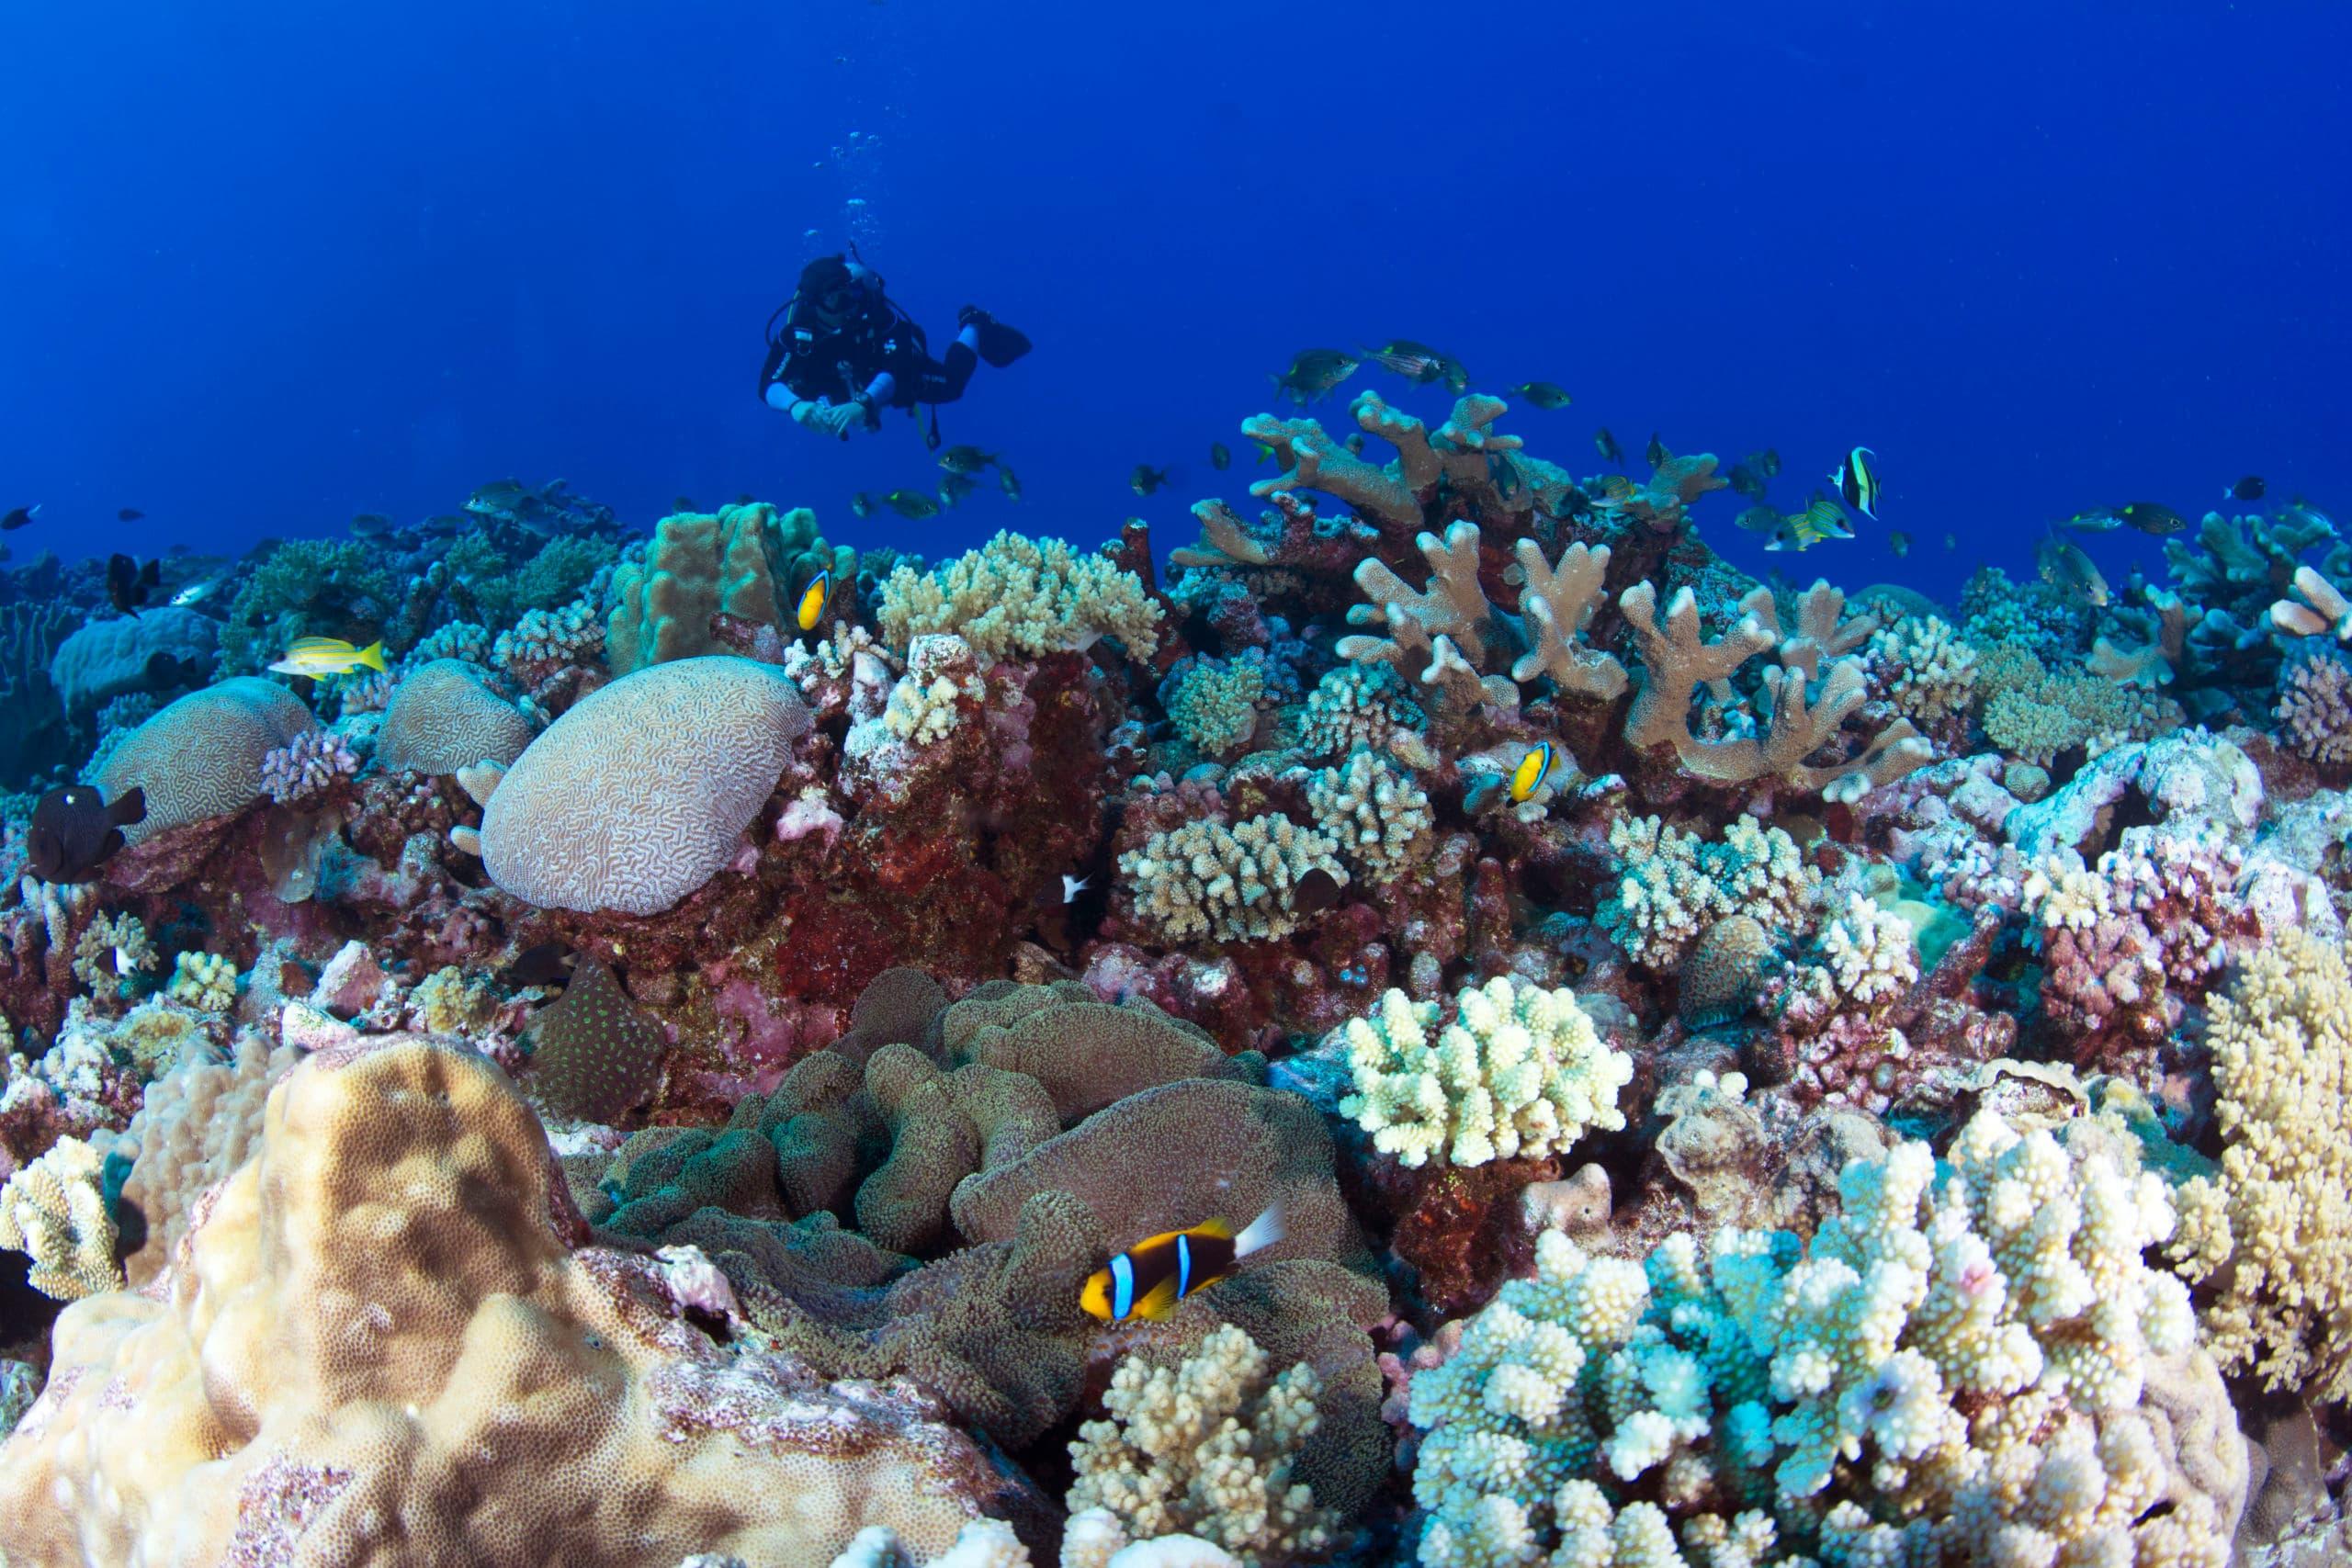 Coral Sea and Ribbon reefs